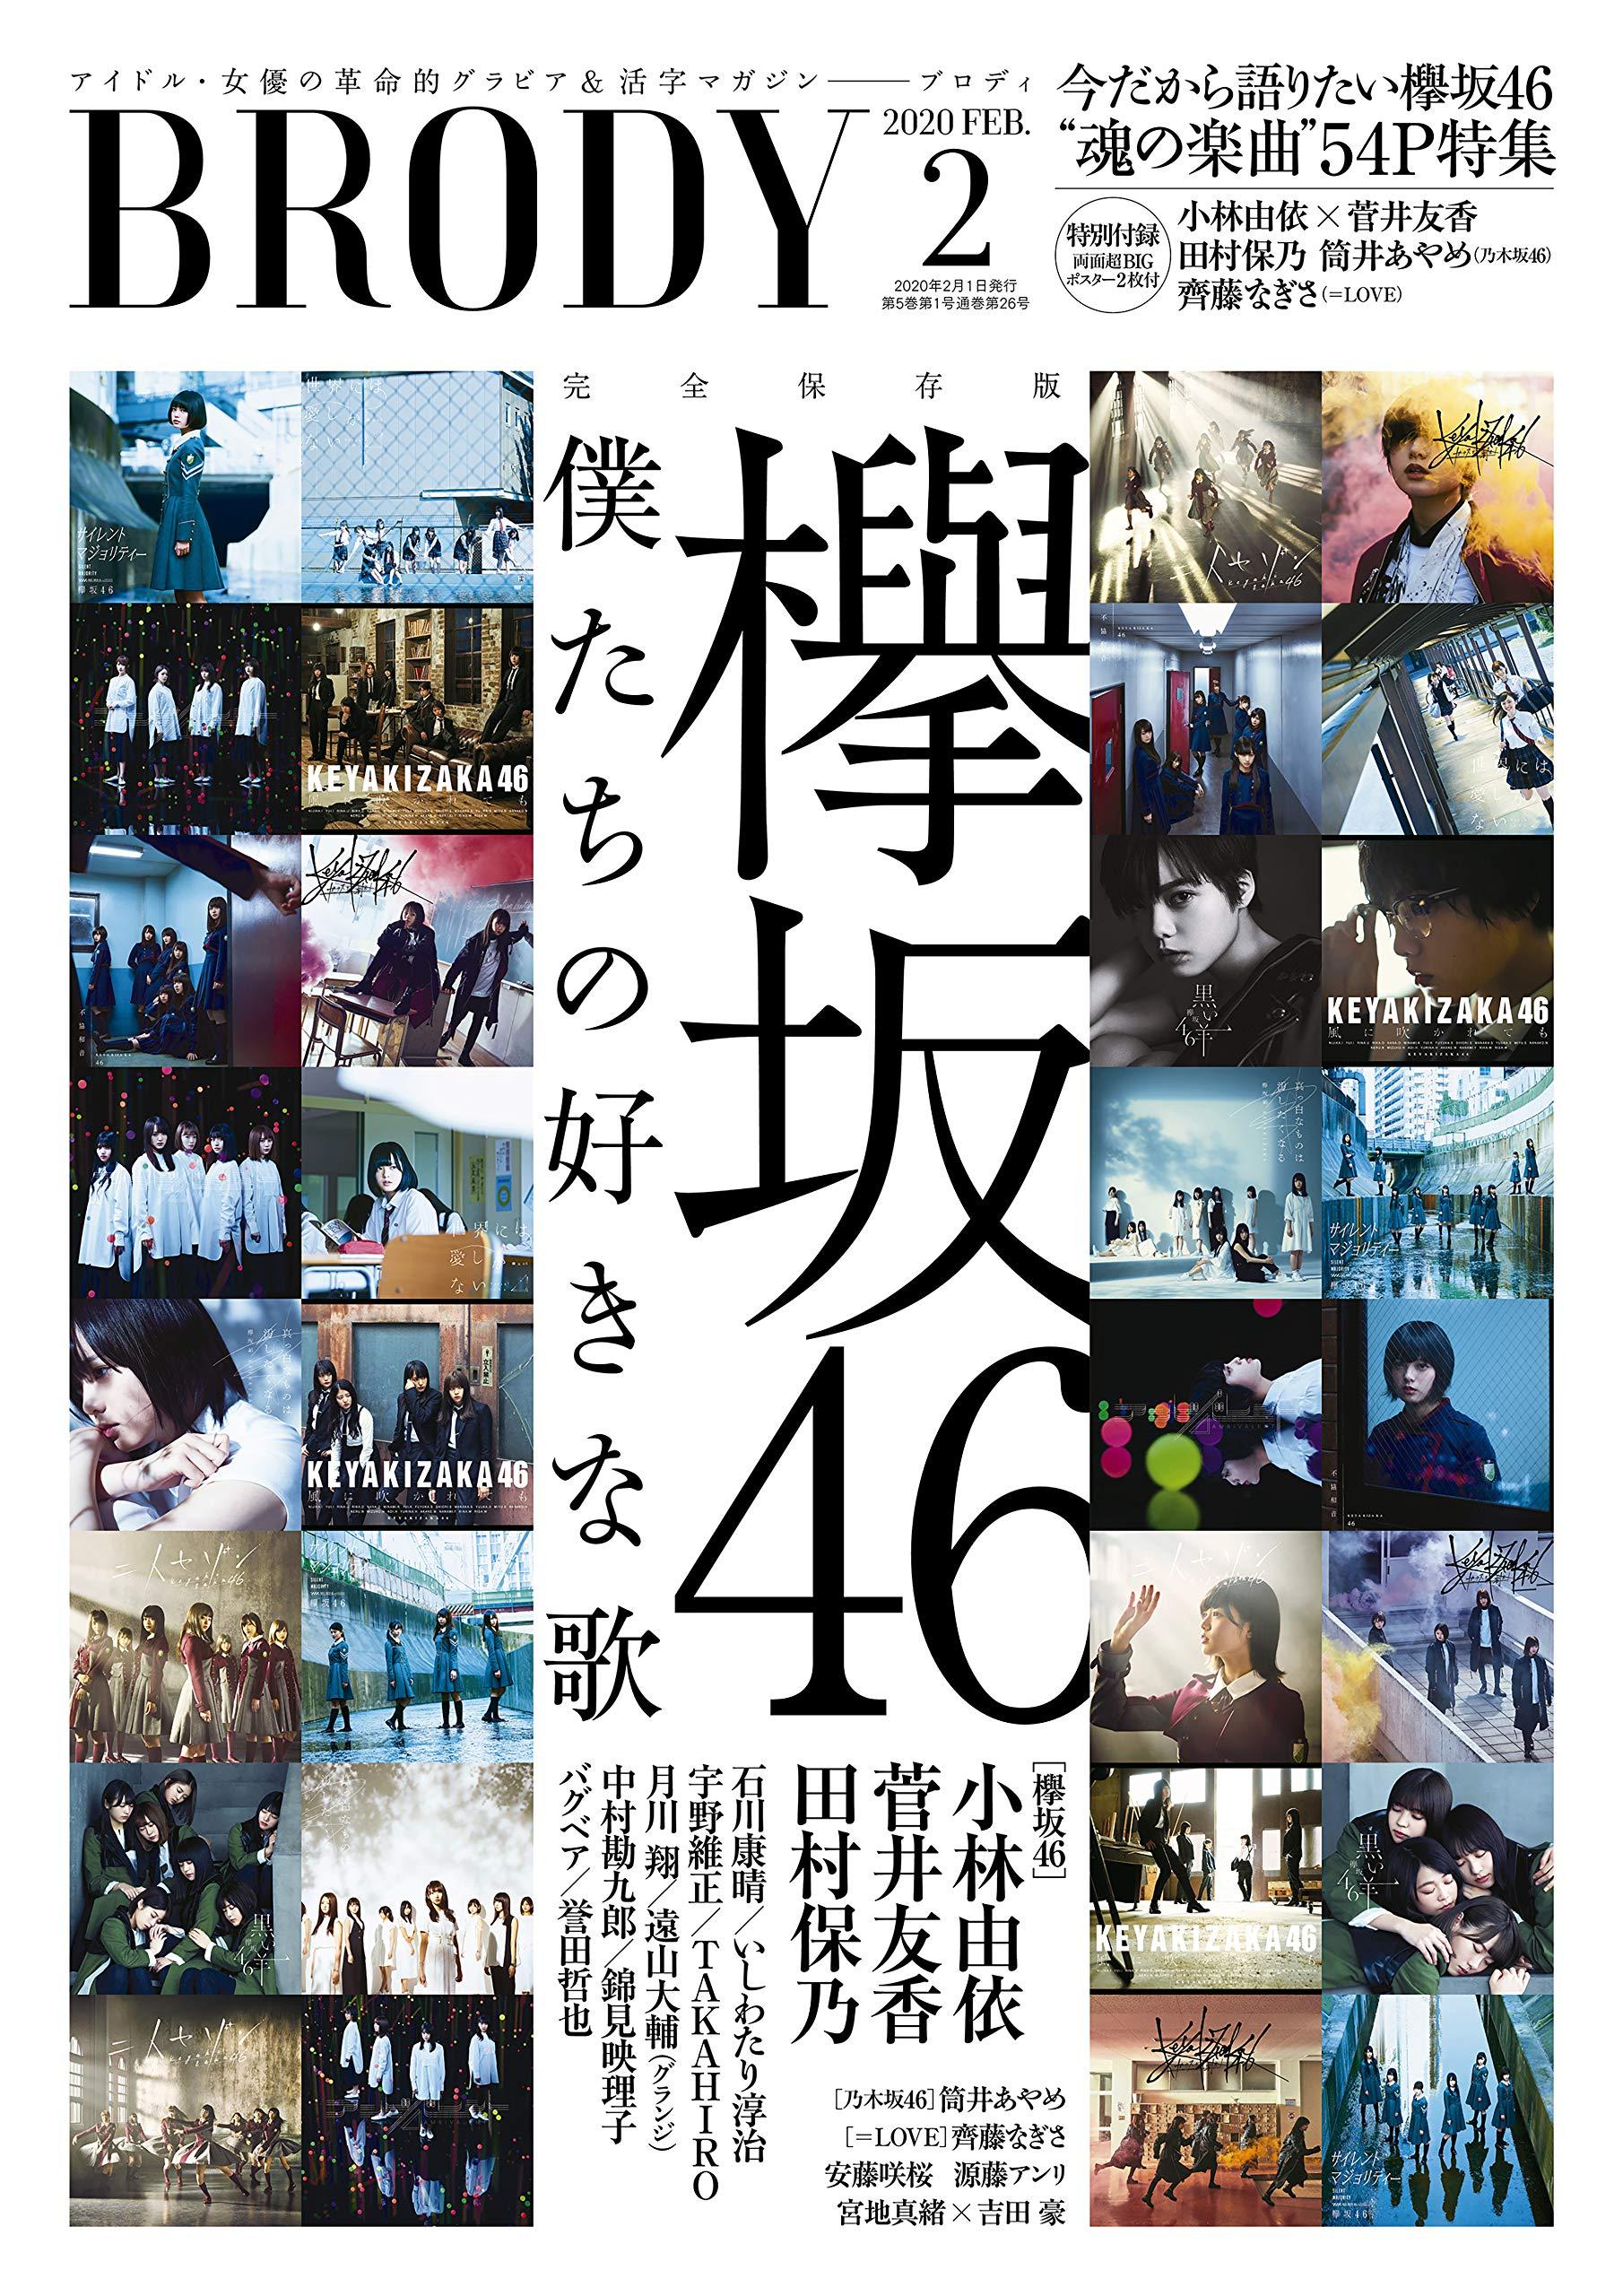 BRODY 2020年02月号 欅坂46